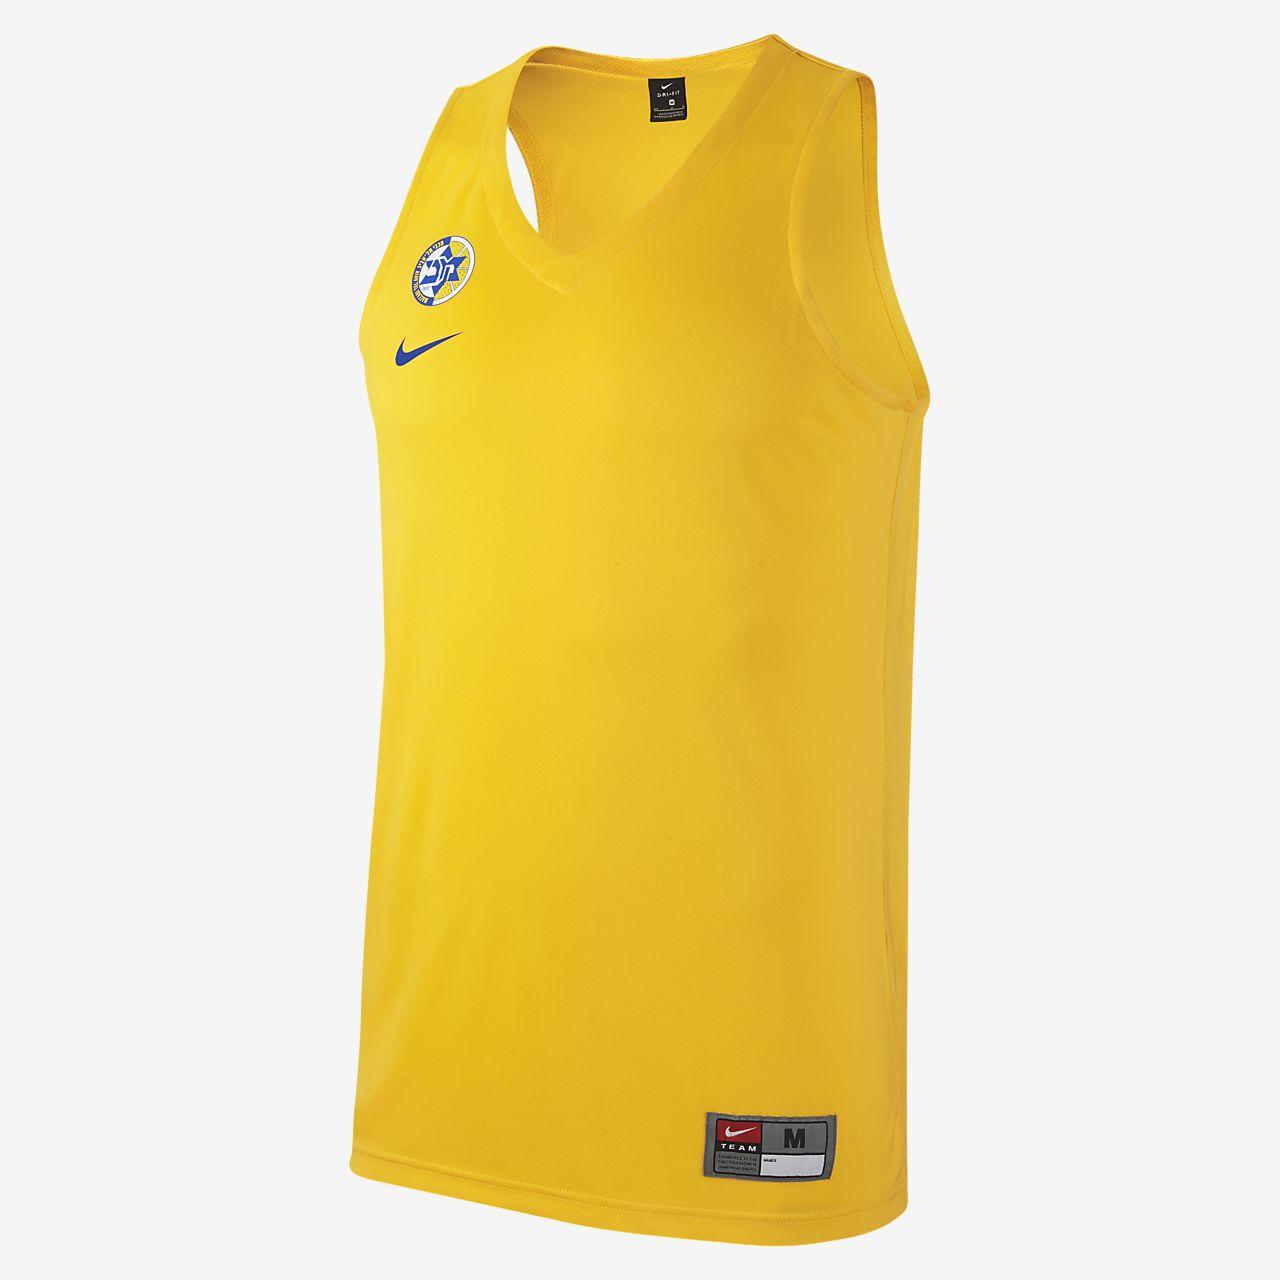 Maccabi Tel Aviv Replica Men's Basketball Jersey